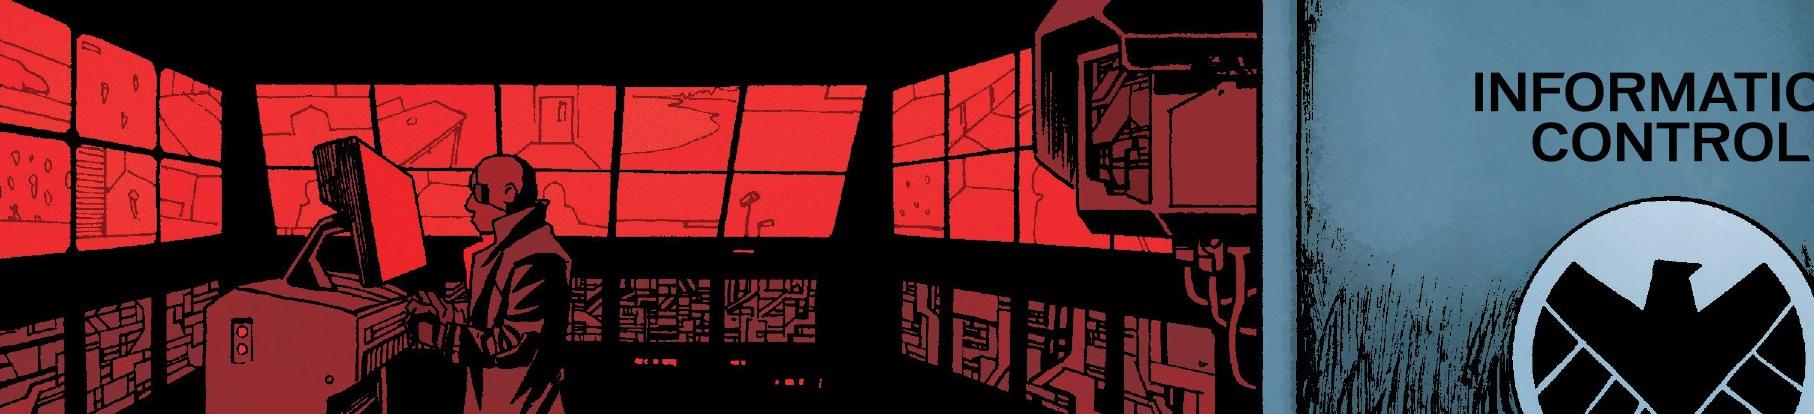 Ogma (S.H.I.E.L.D. Base)/Gallery